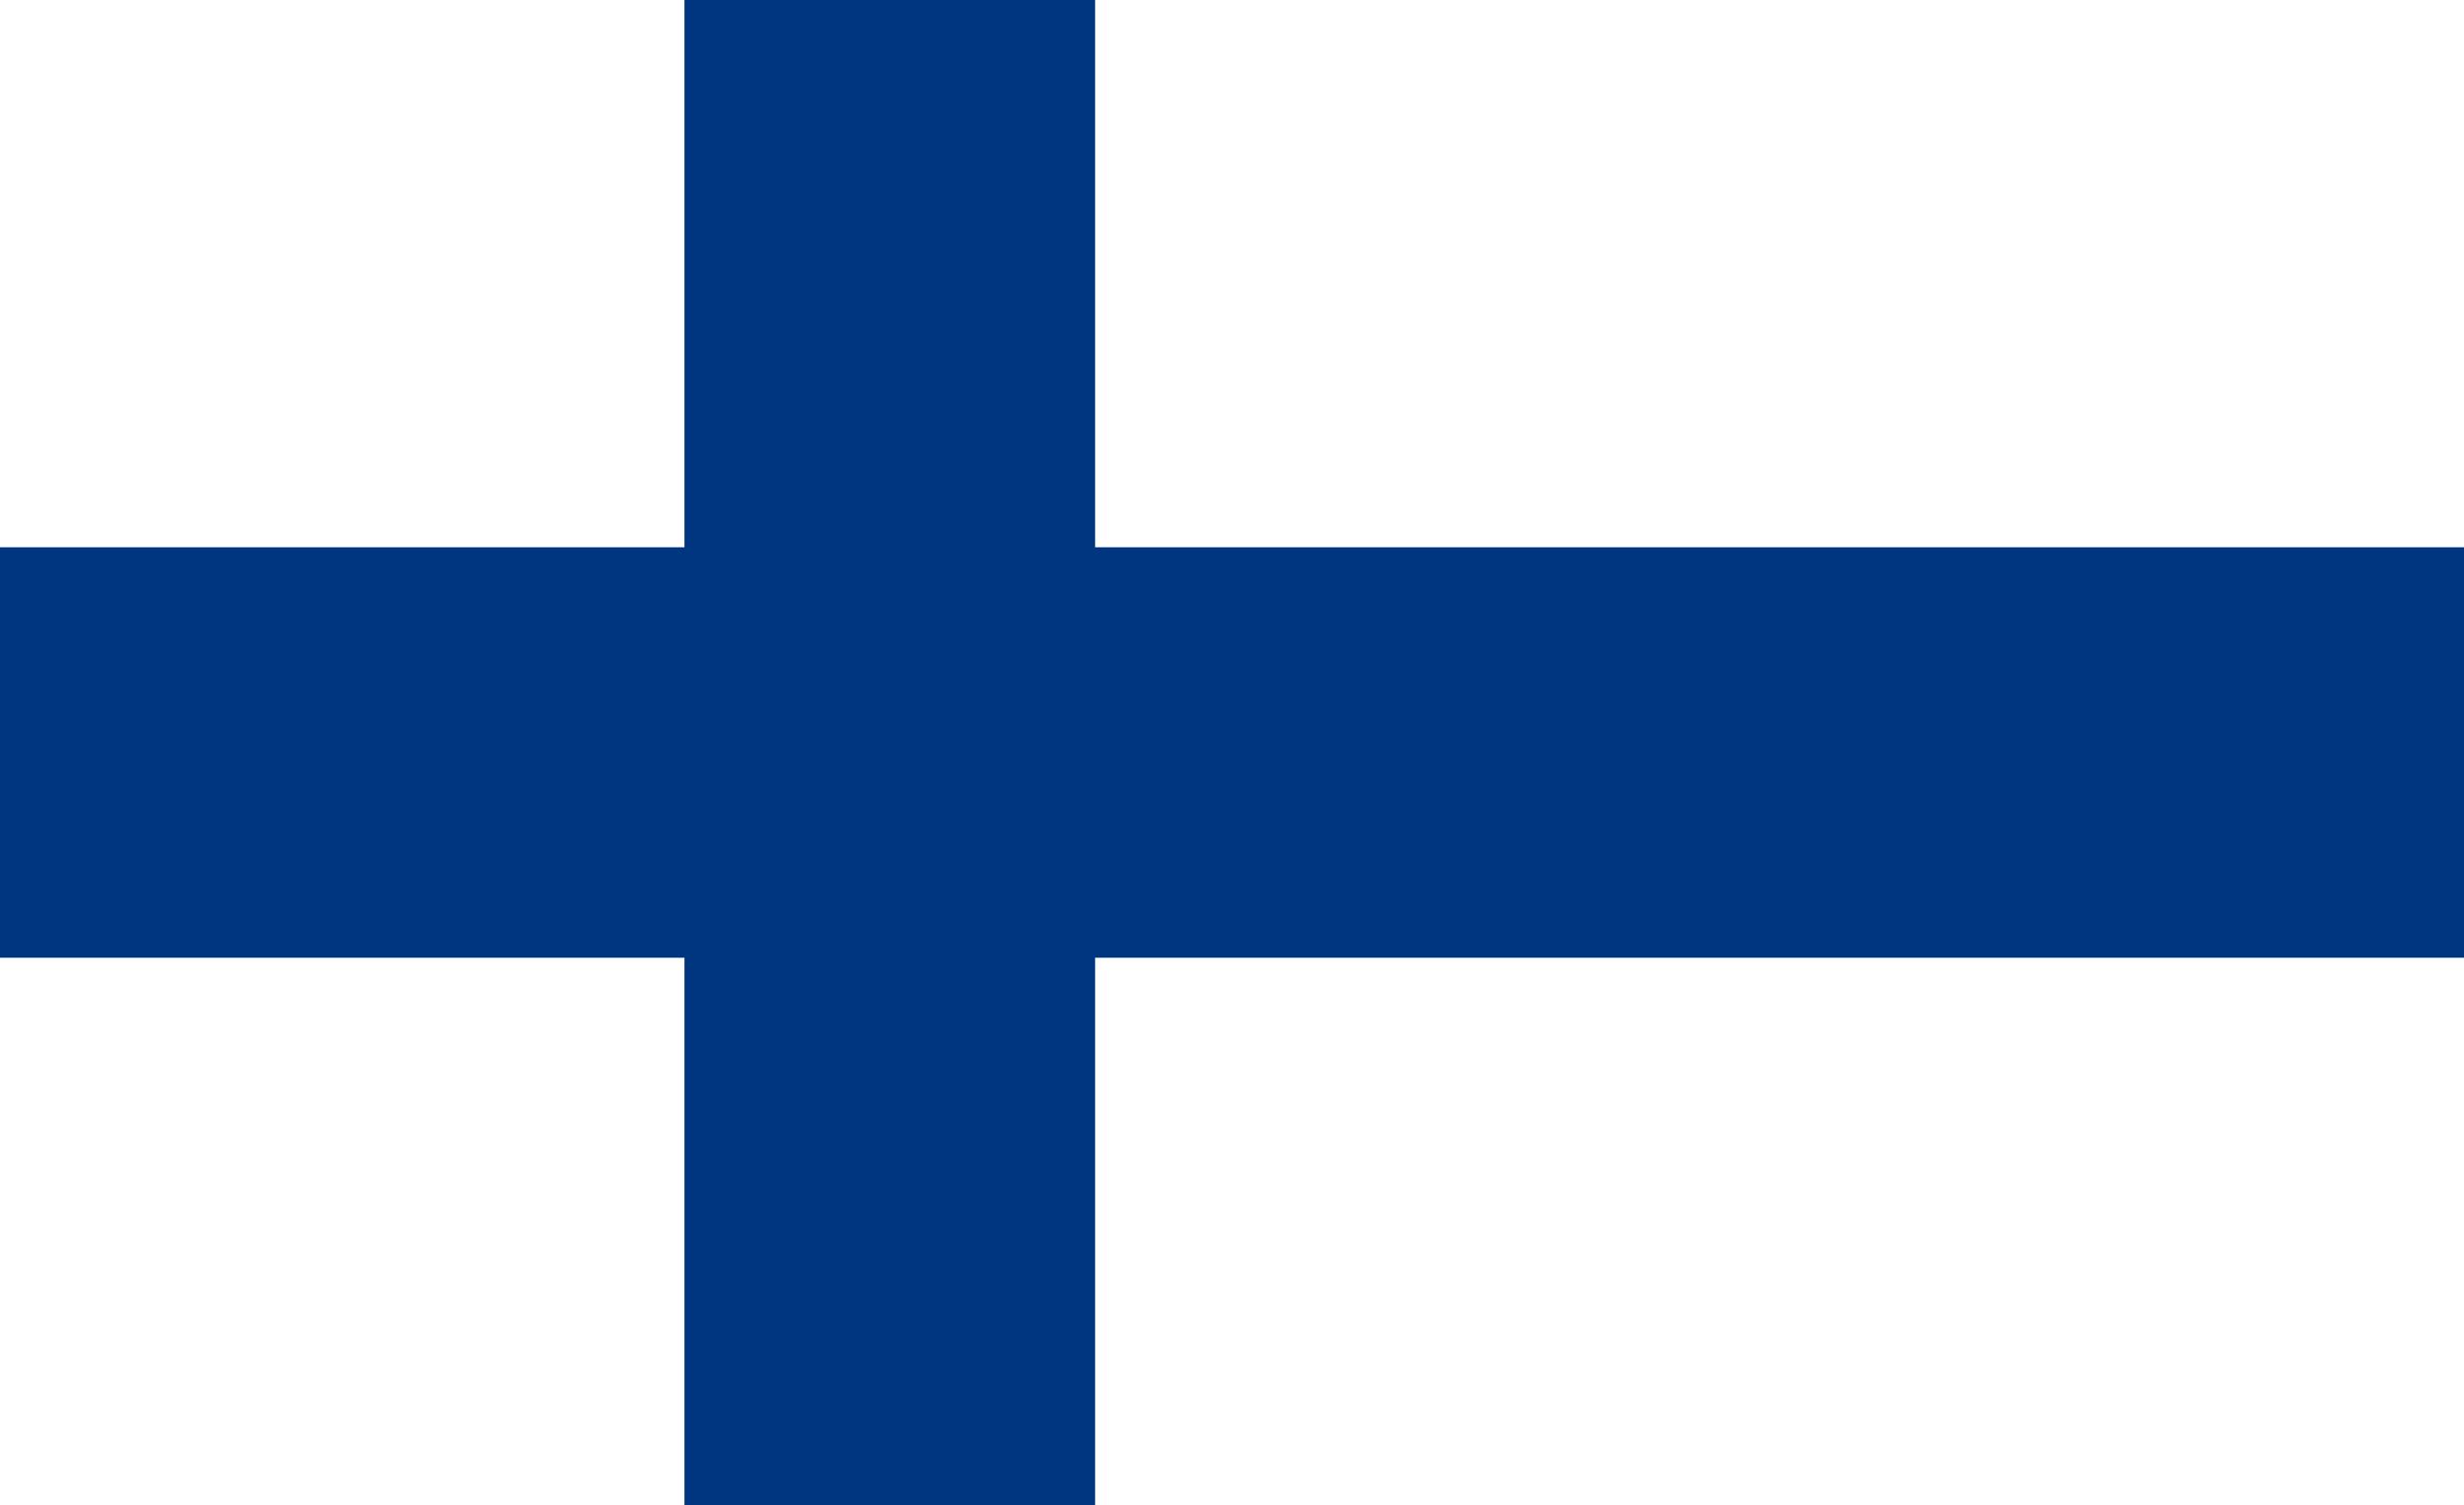 finlandia, país, emblema, insignia, символ - Обои HD - Профессор falken.com